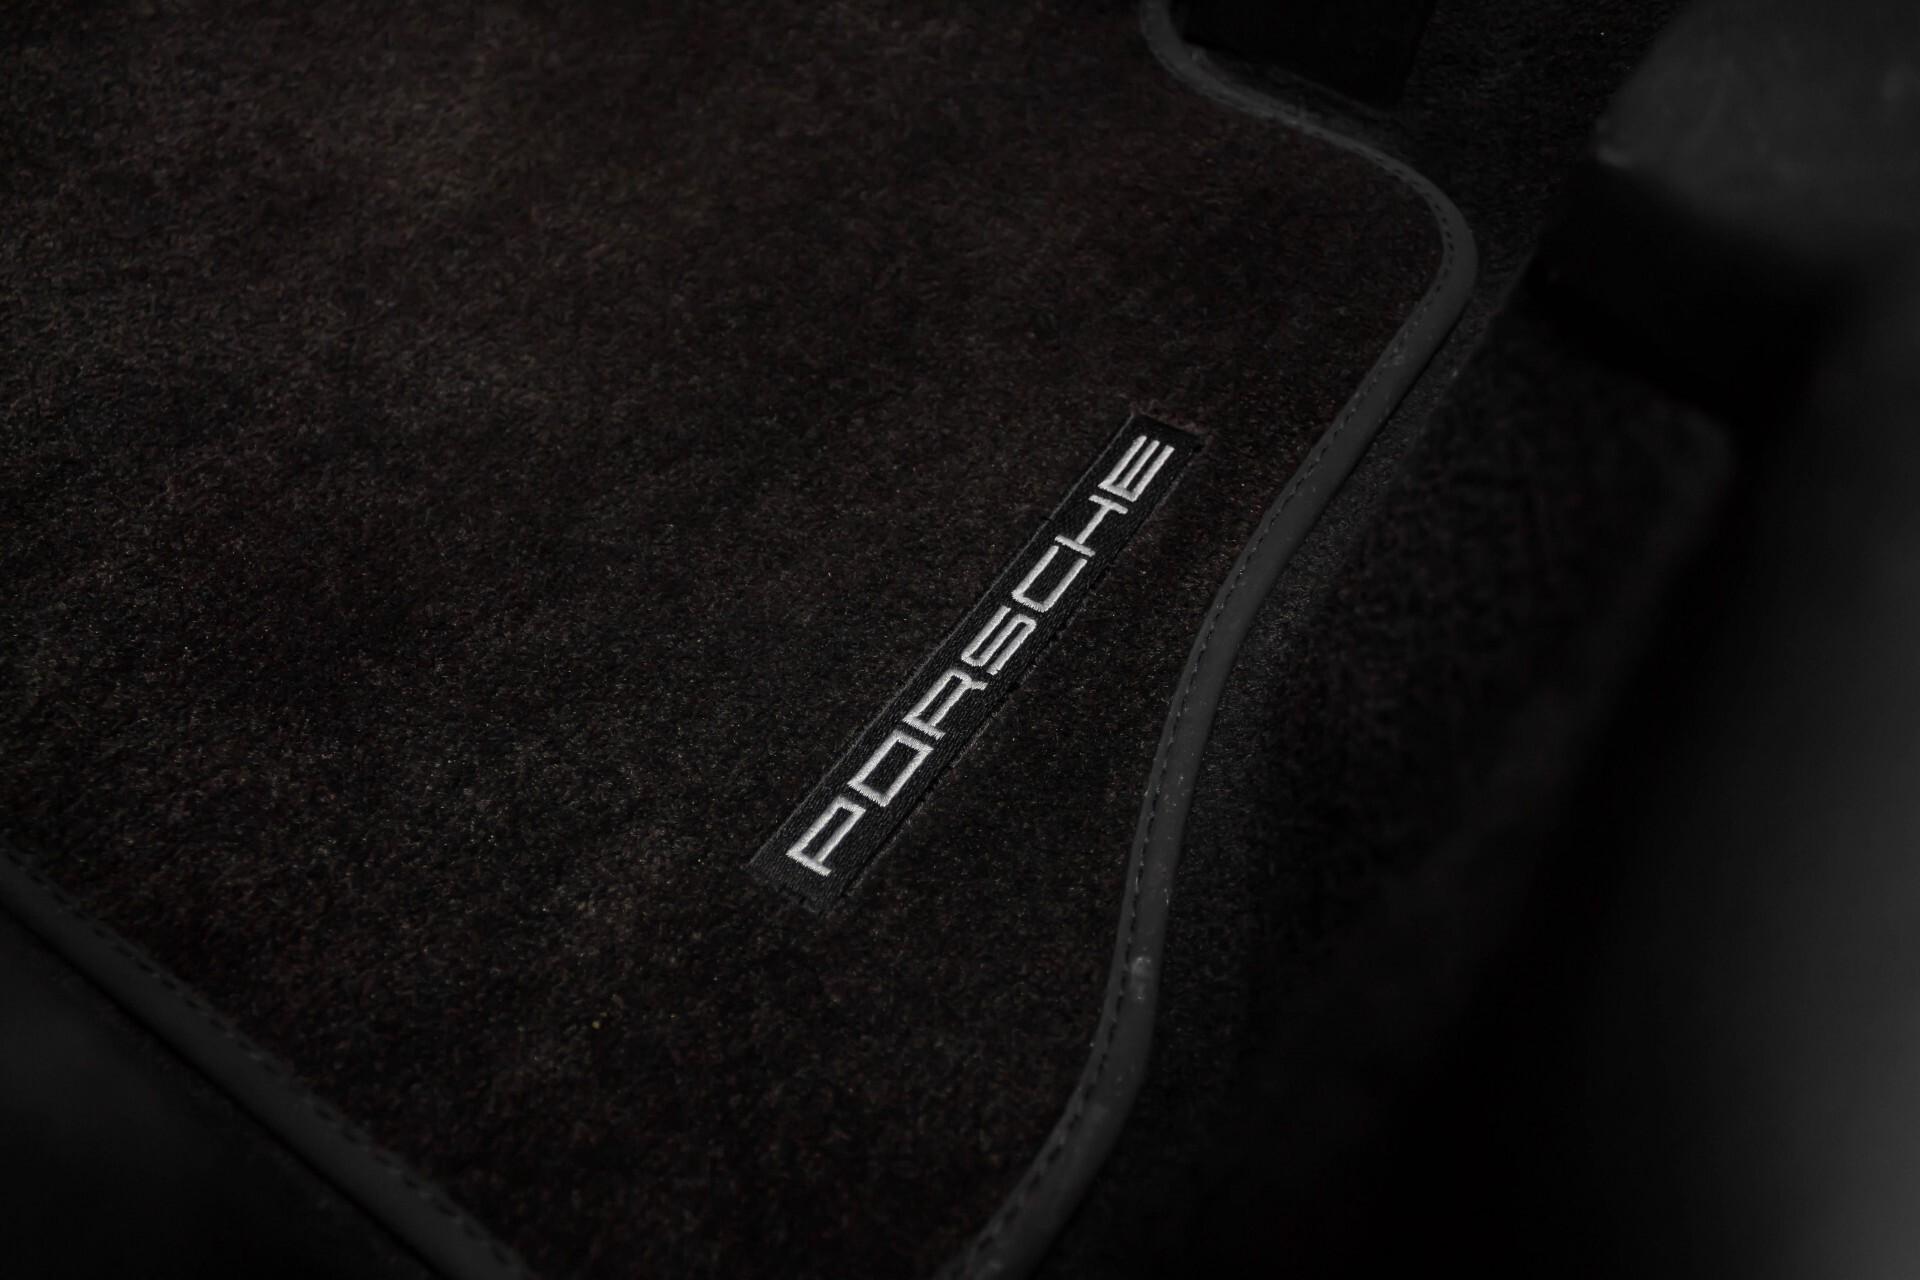 Porsche Panamera 3.6 4 Sportchrono/Luchtvering/Dak/Nappa/Aut7 Foto 42